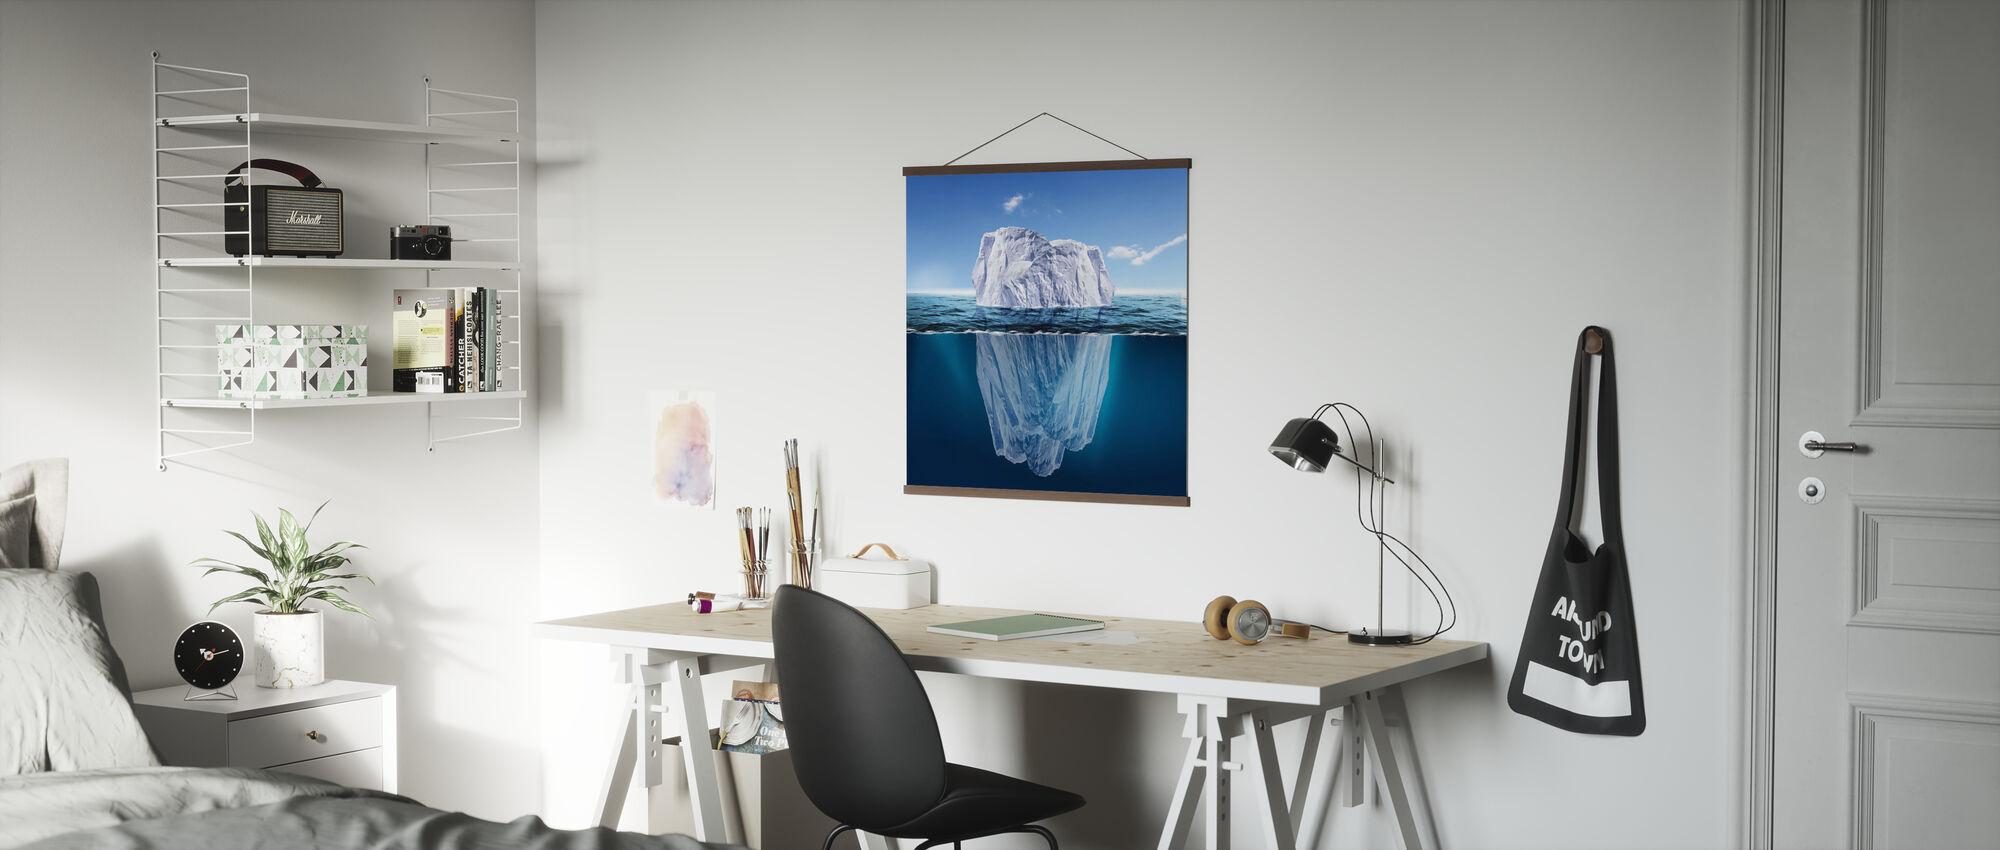 Hidden Beneath the Surface - Poster - Office